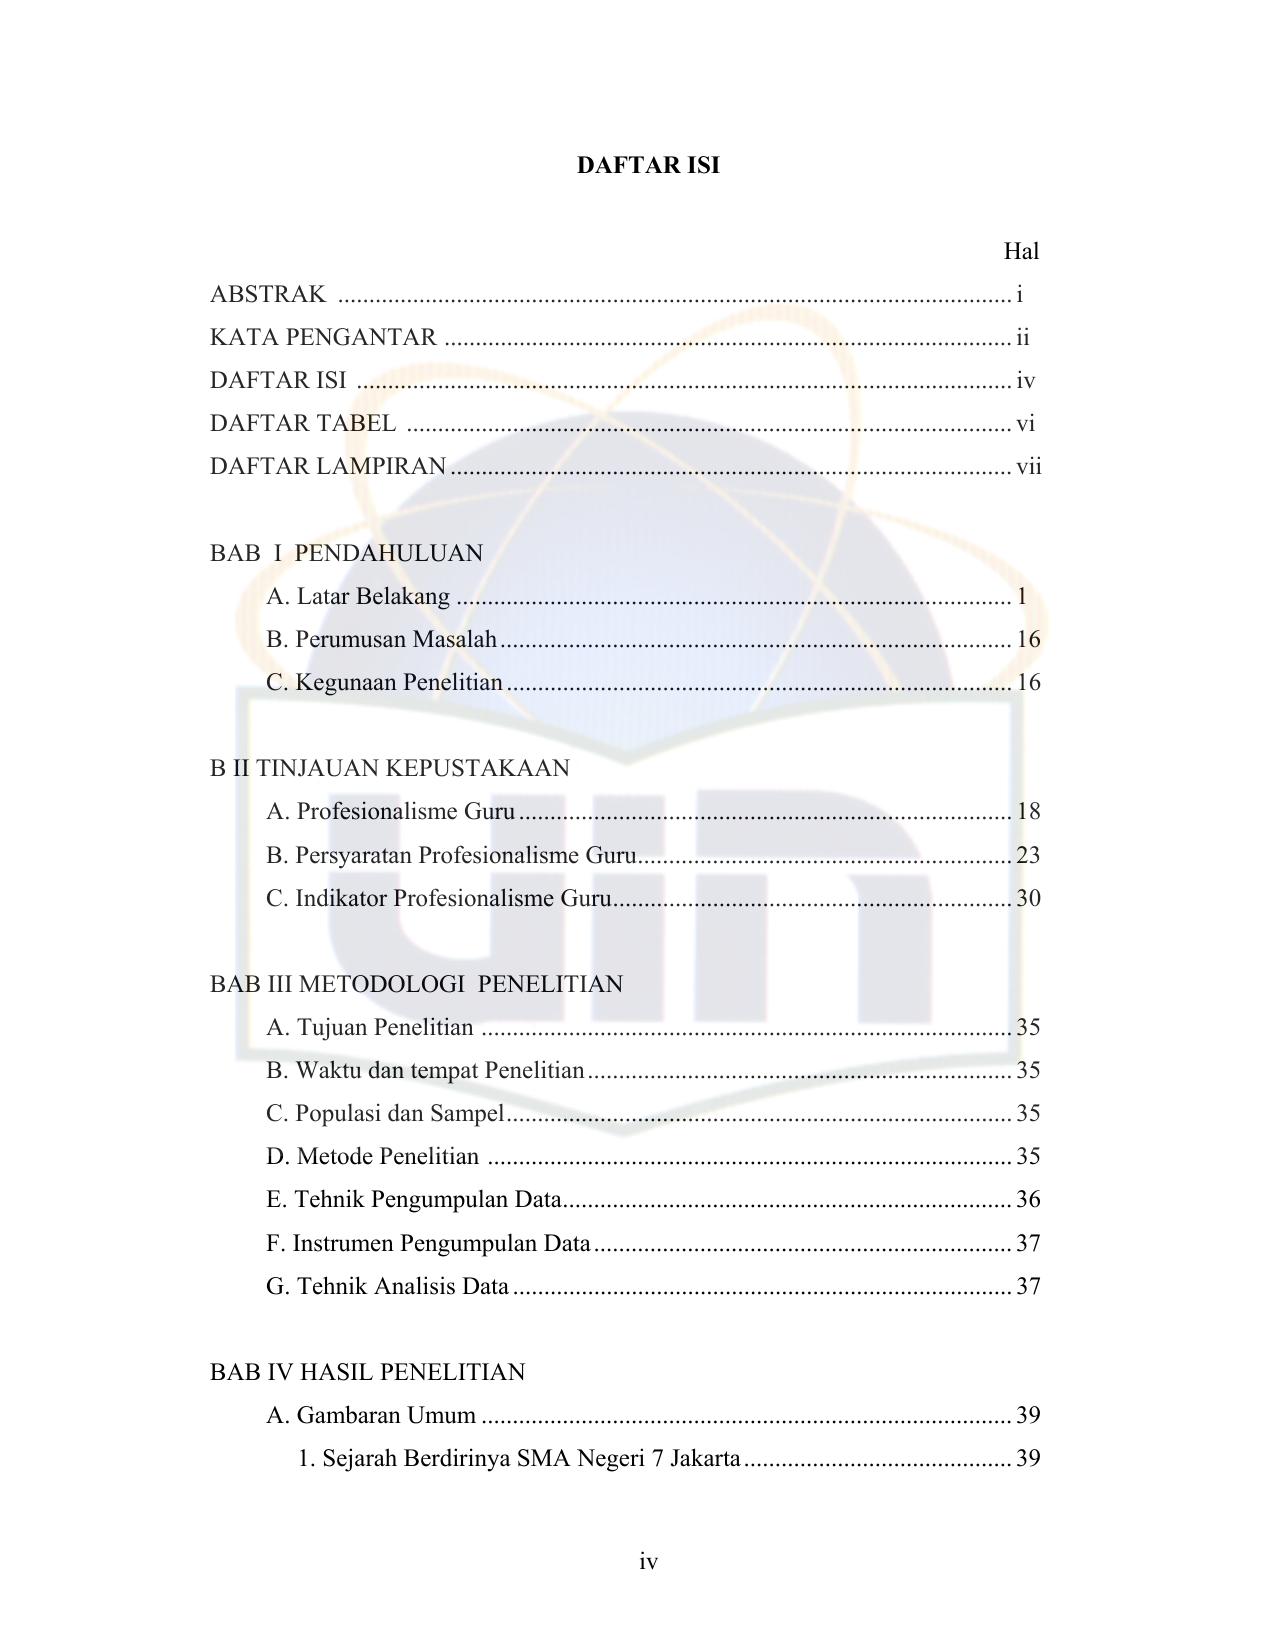 Daftar Isi Hal Abstrak Repository Uin Jakarta